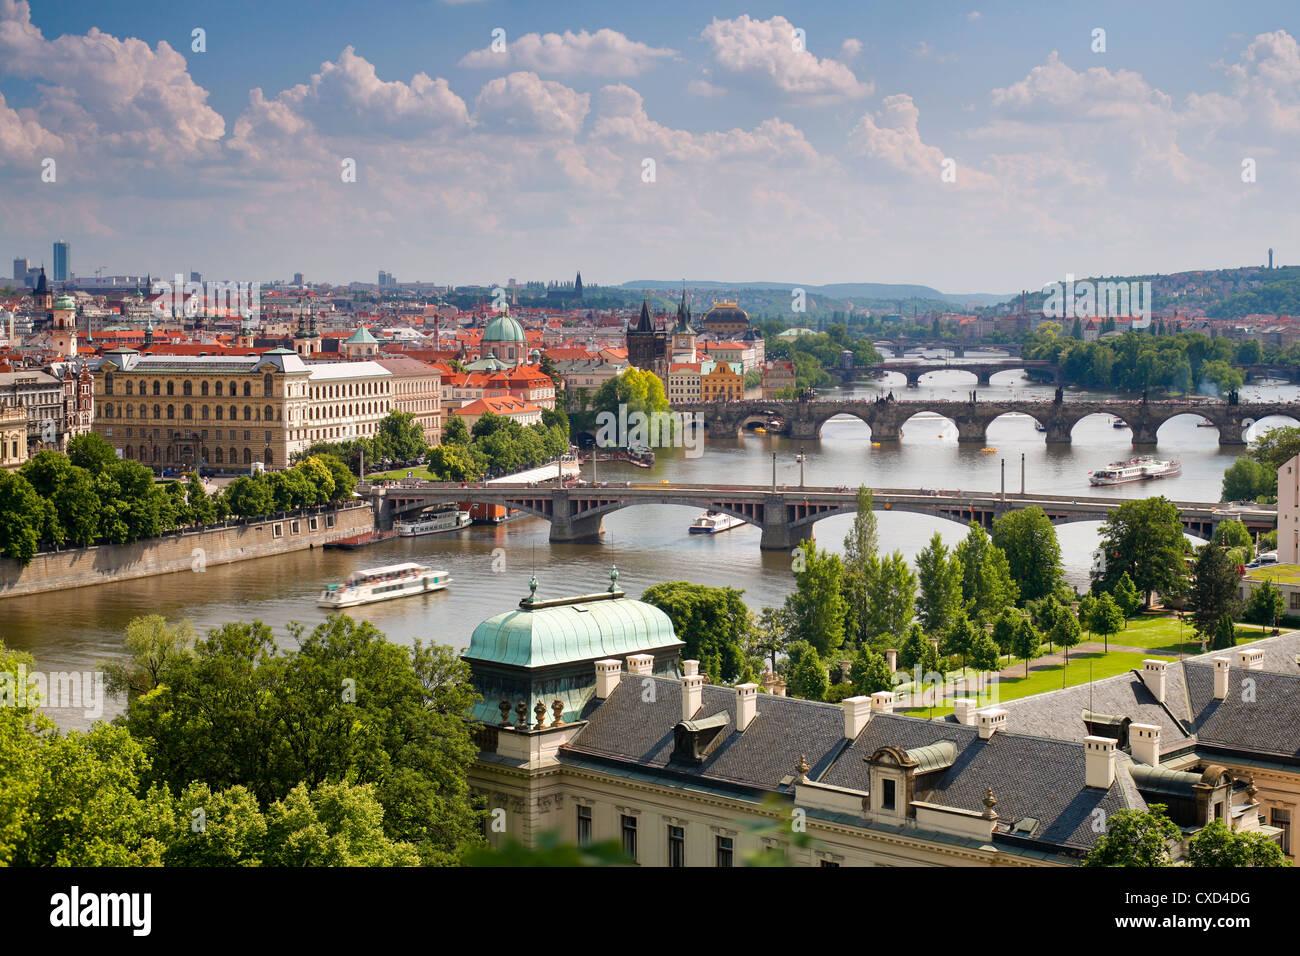 View of the River Vltava and bridges, Prague, Czech Republic, Europe - Stock Image